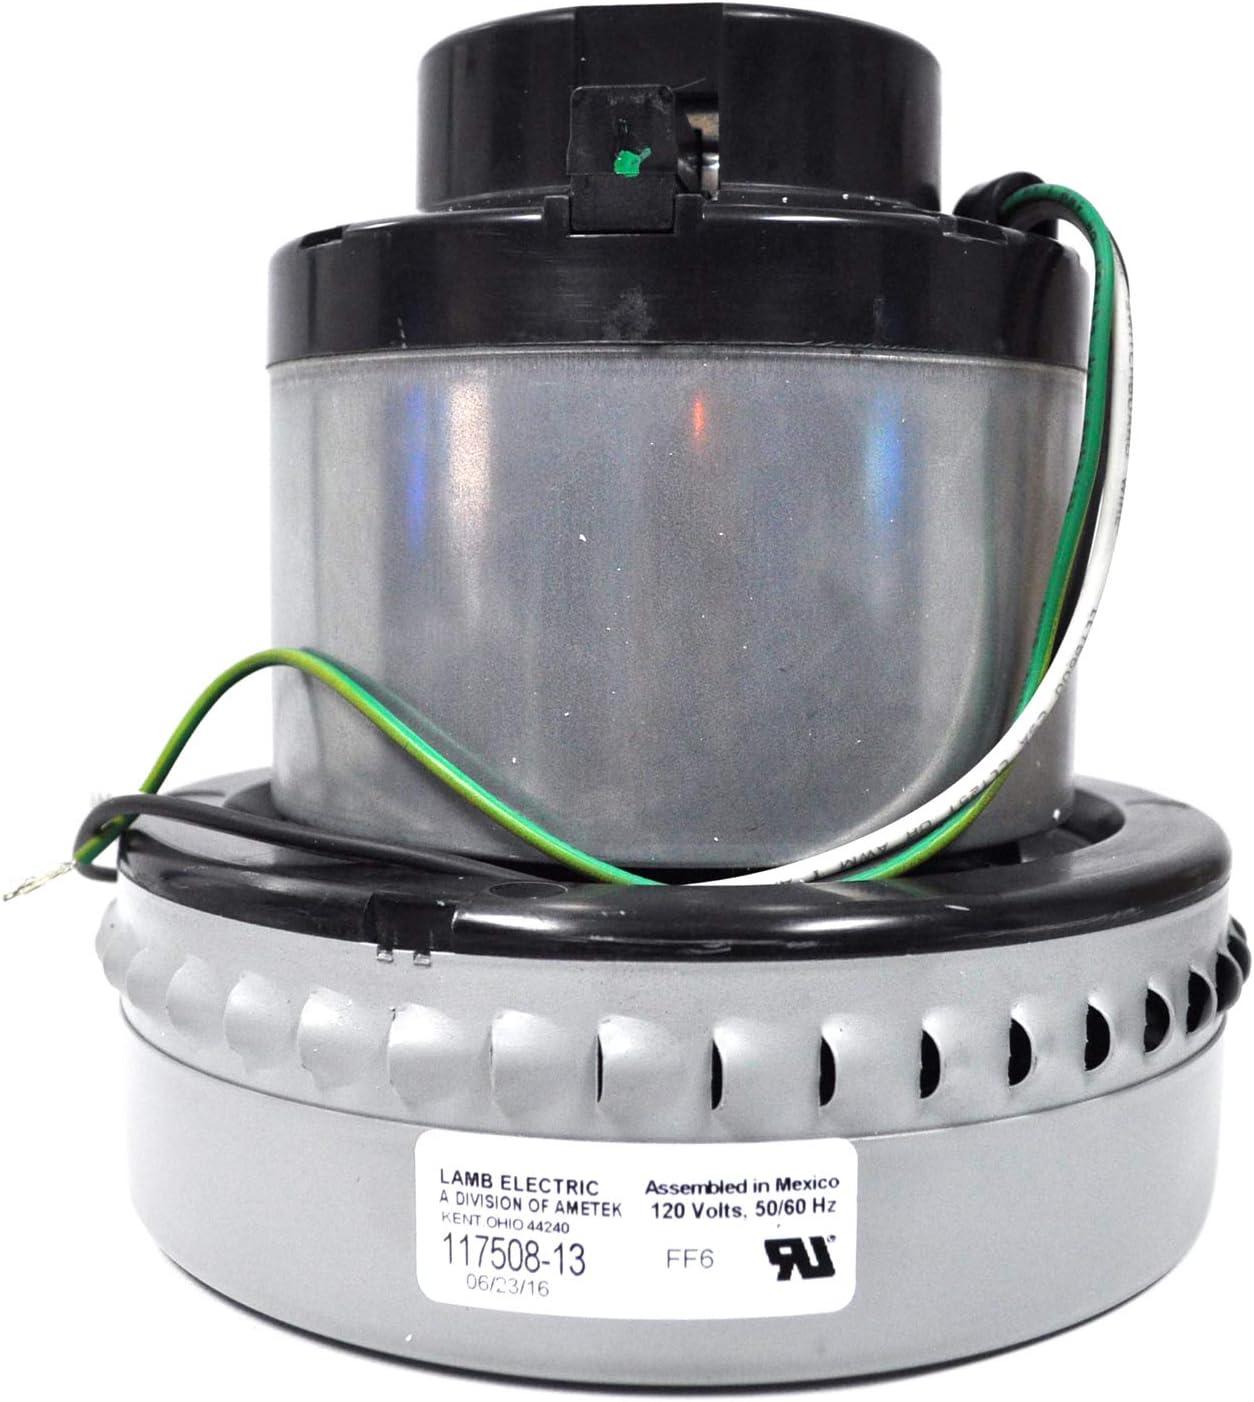 Ametek Lamb 7.2 Inch 2 Stage Bypass Vacuum Motor 117508-13